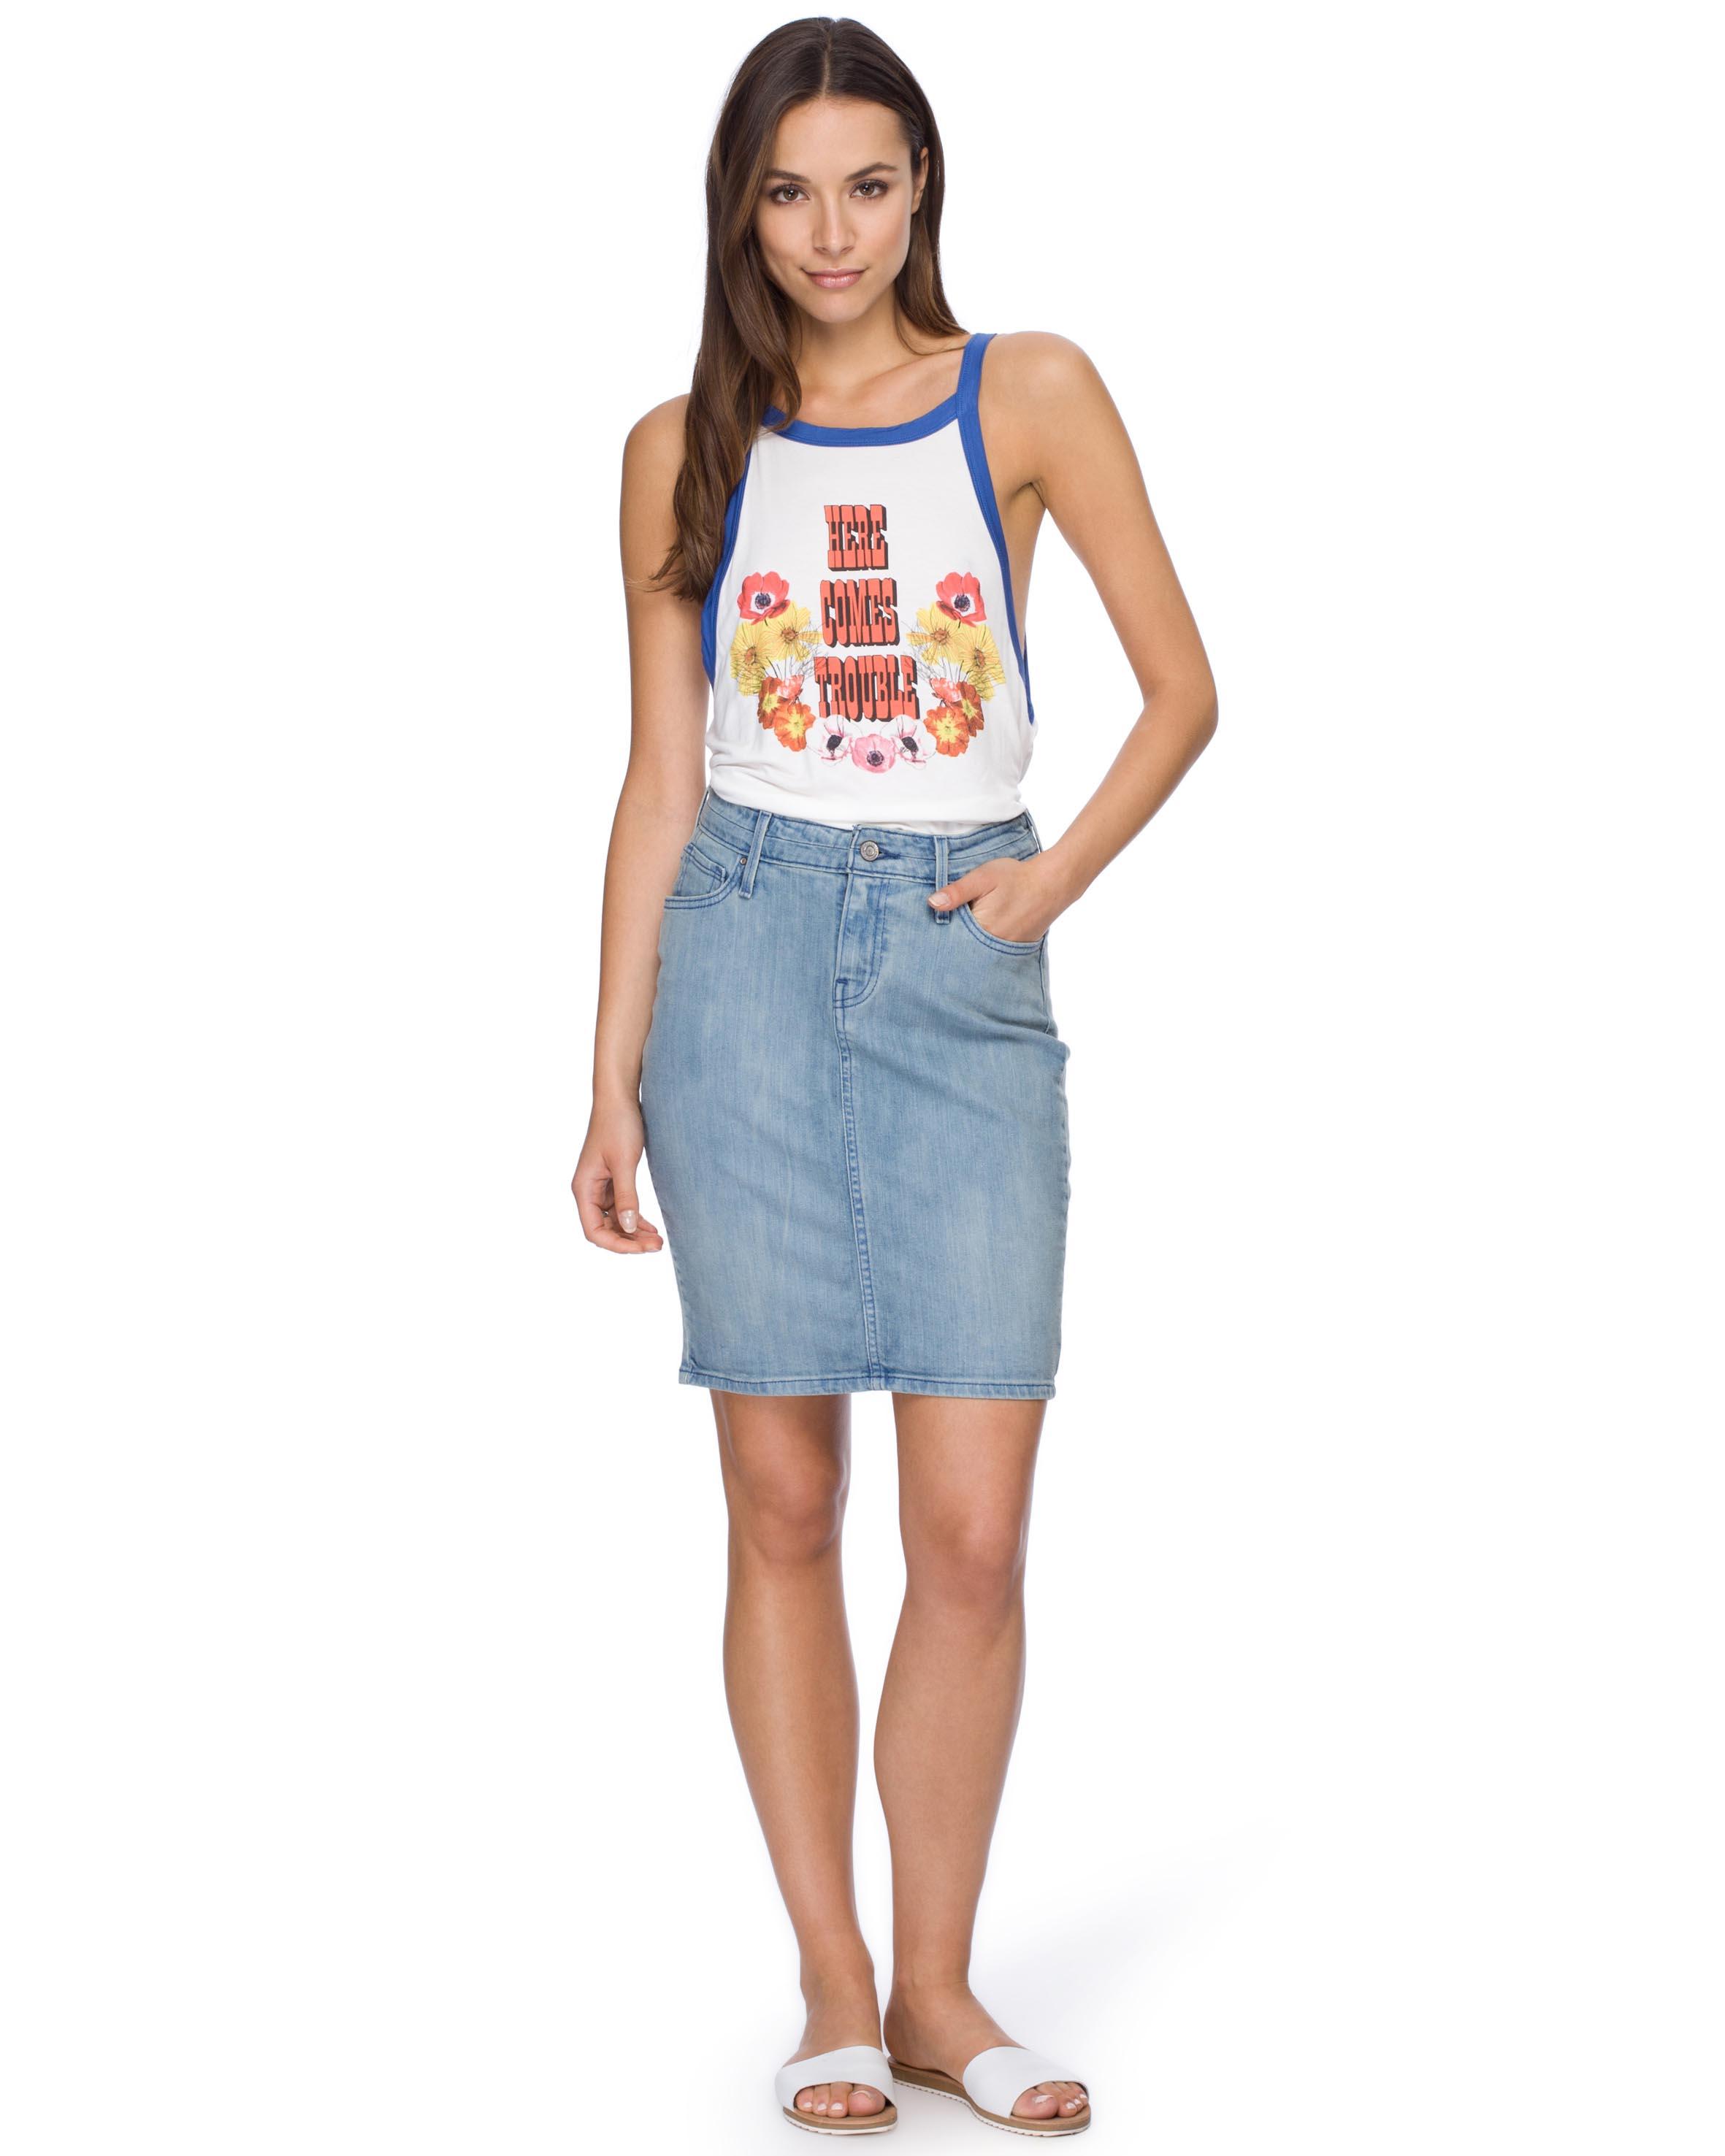 Cheap womens clothes online australia